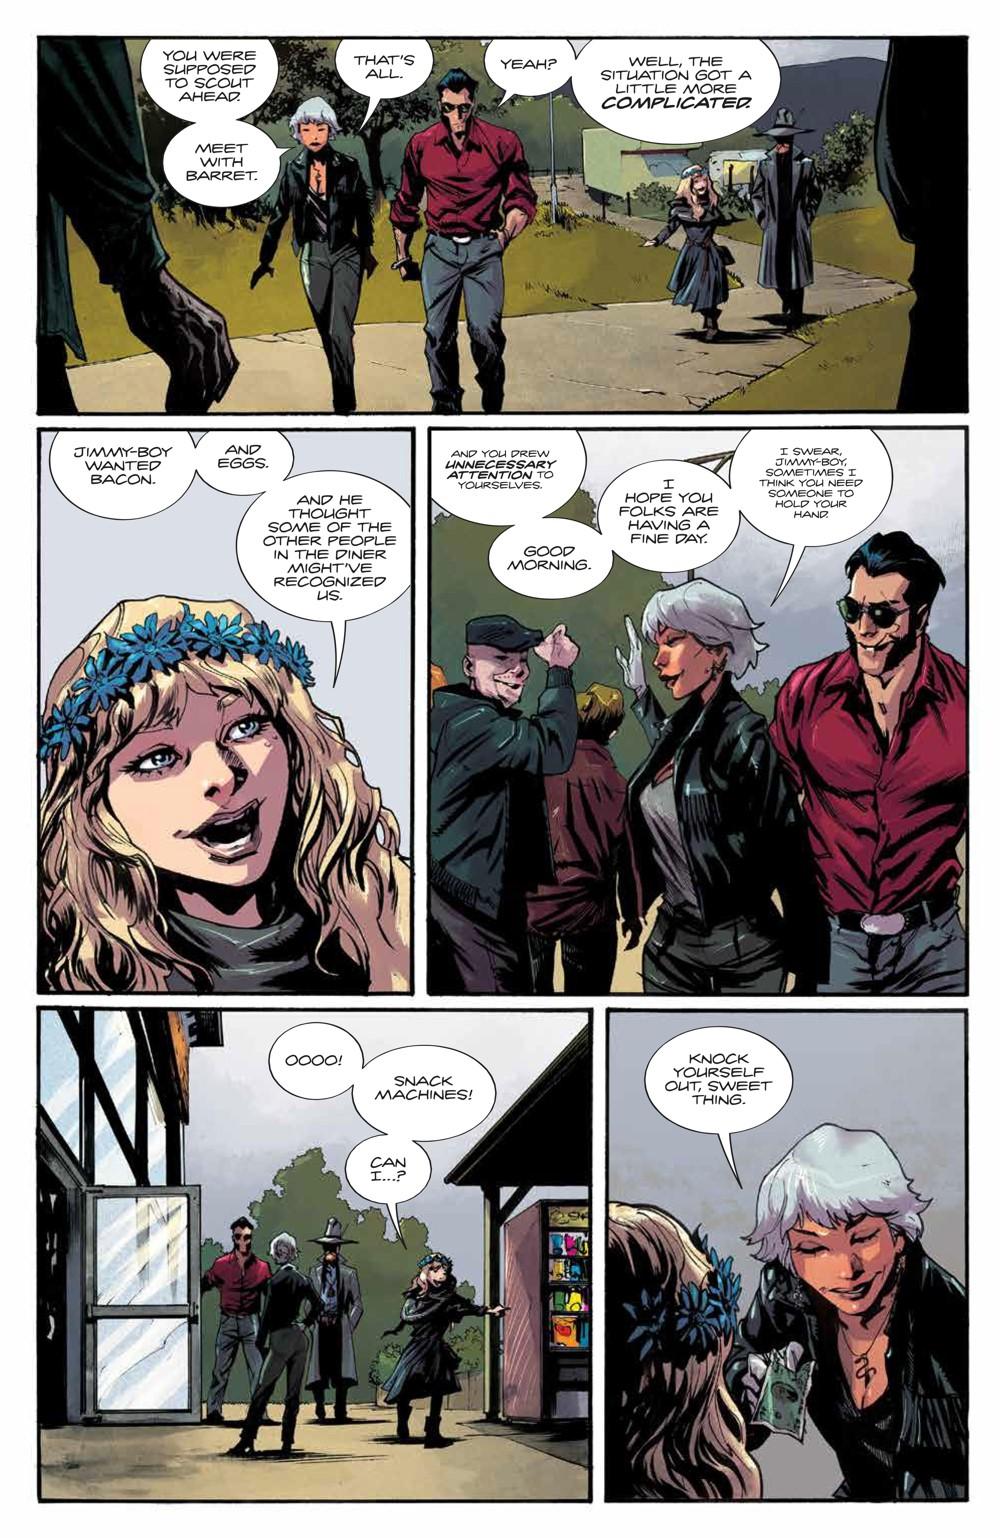 Basilisk_003_PRESS_9 ComicList Previews: BASILISK #3